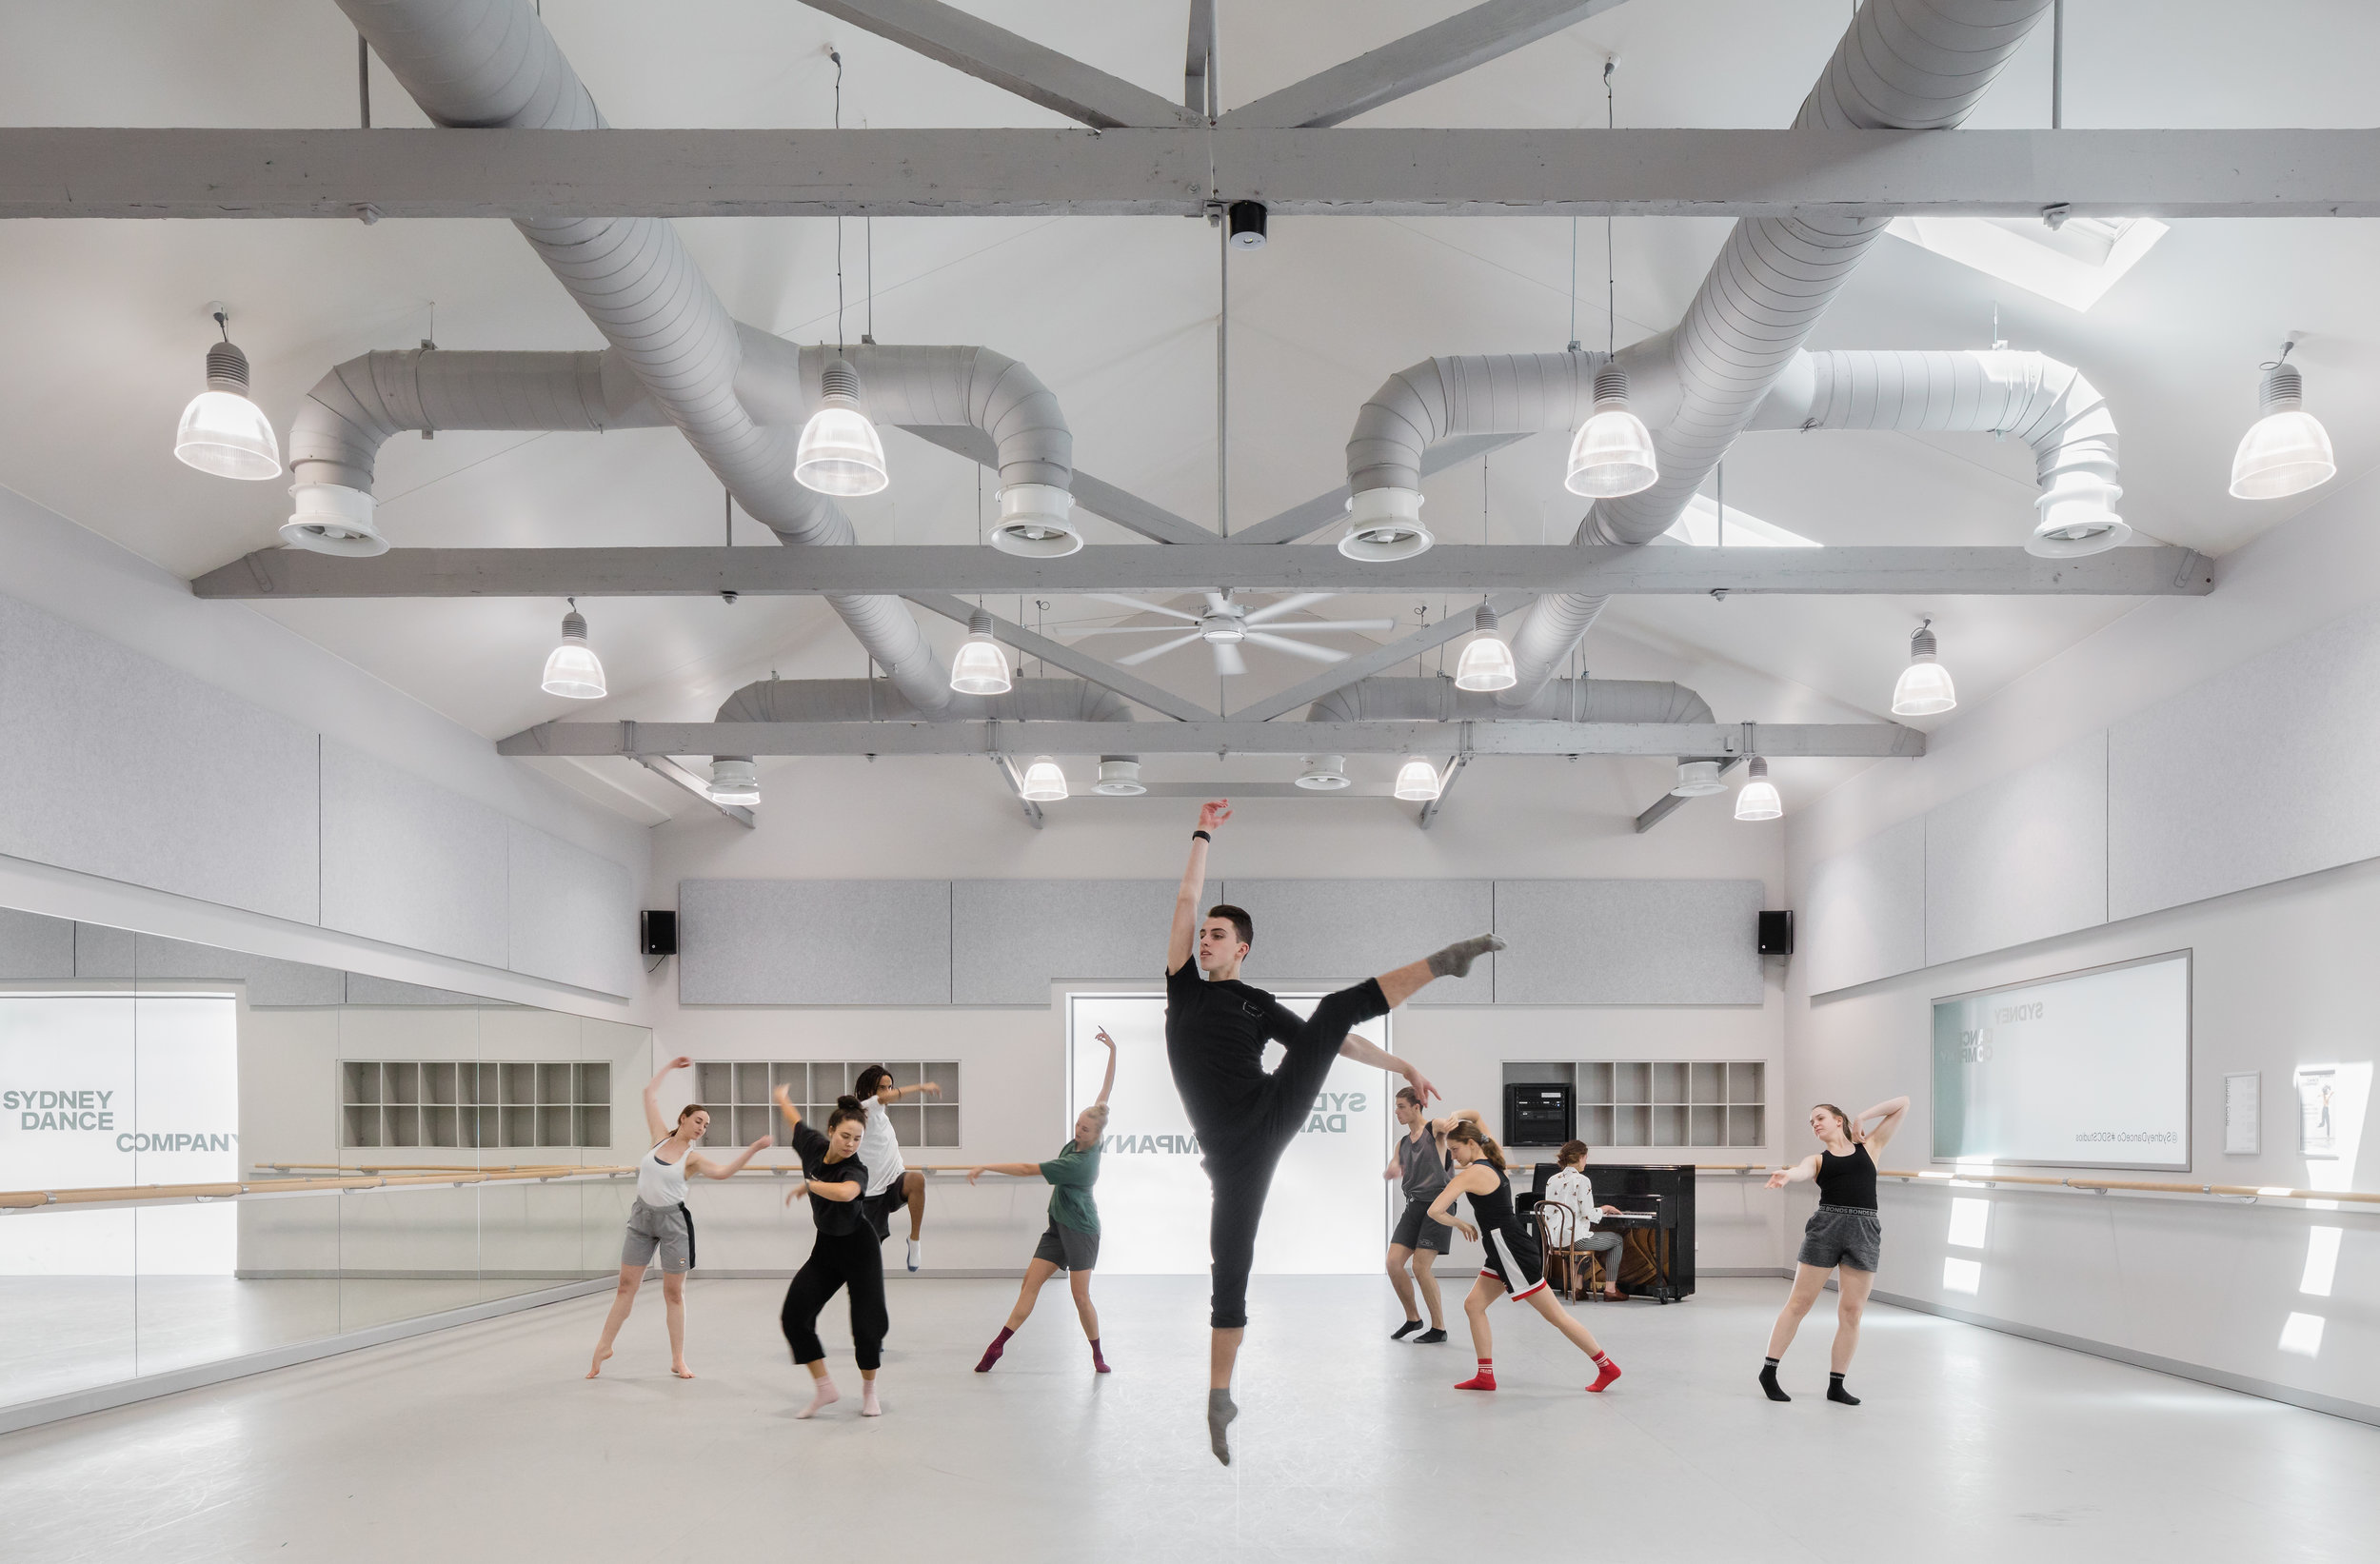 3114-interior_Sydney Dance Company Rehearsal Studios_ Dunn+HIllam Architects_Kat Lu photography_01.jpg